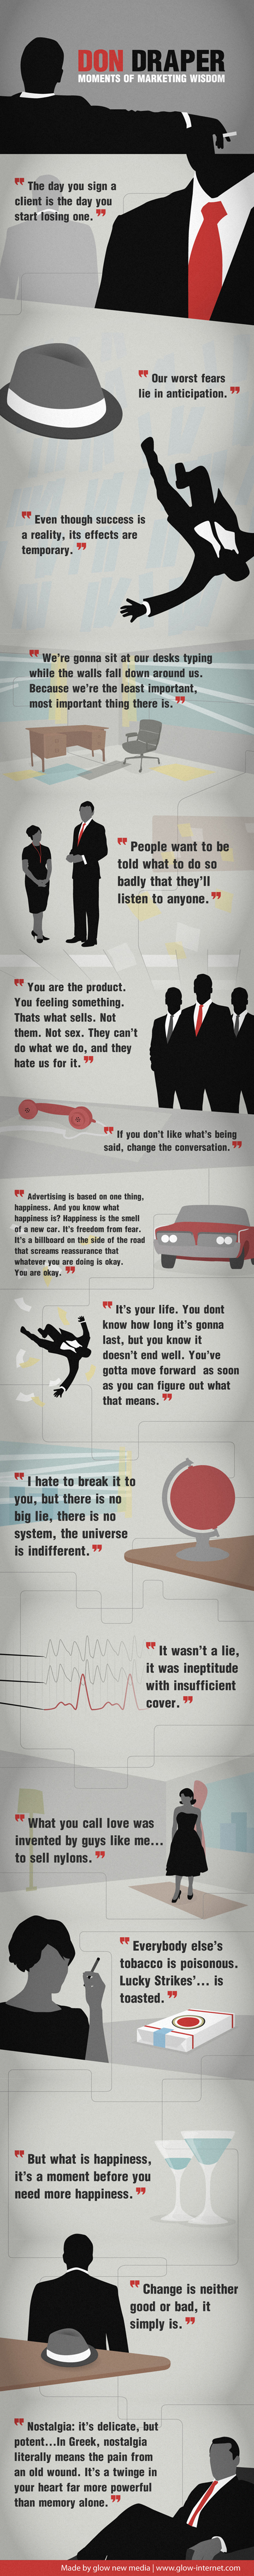 16 frases sobre publicidad de Don Draper